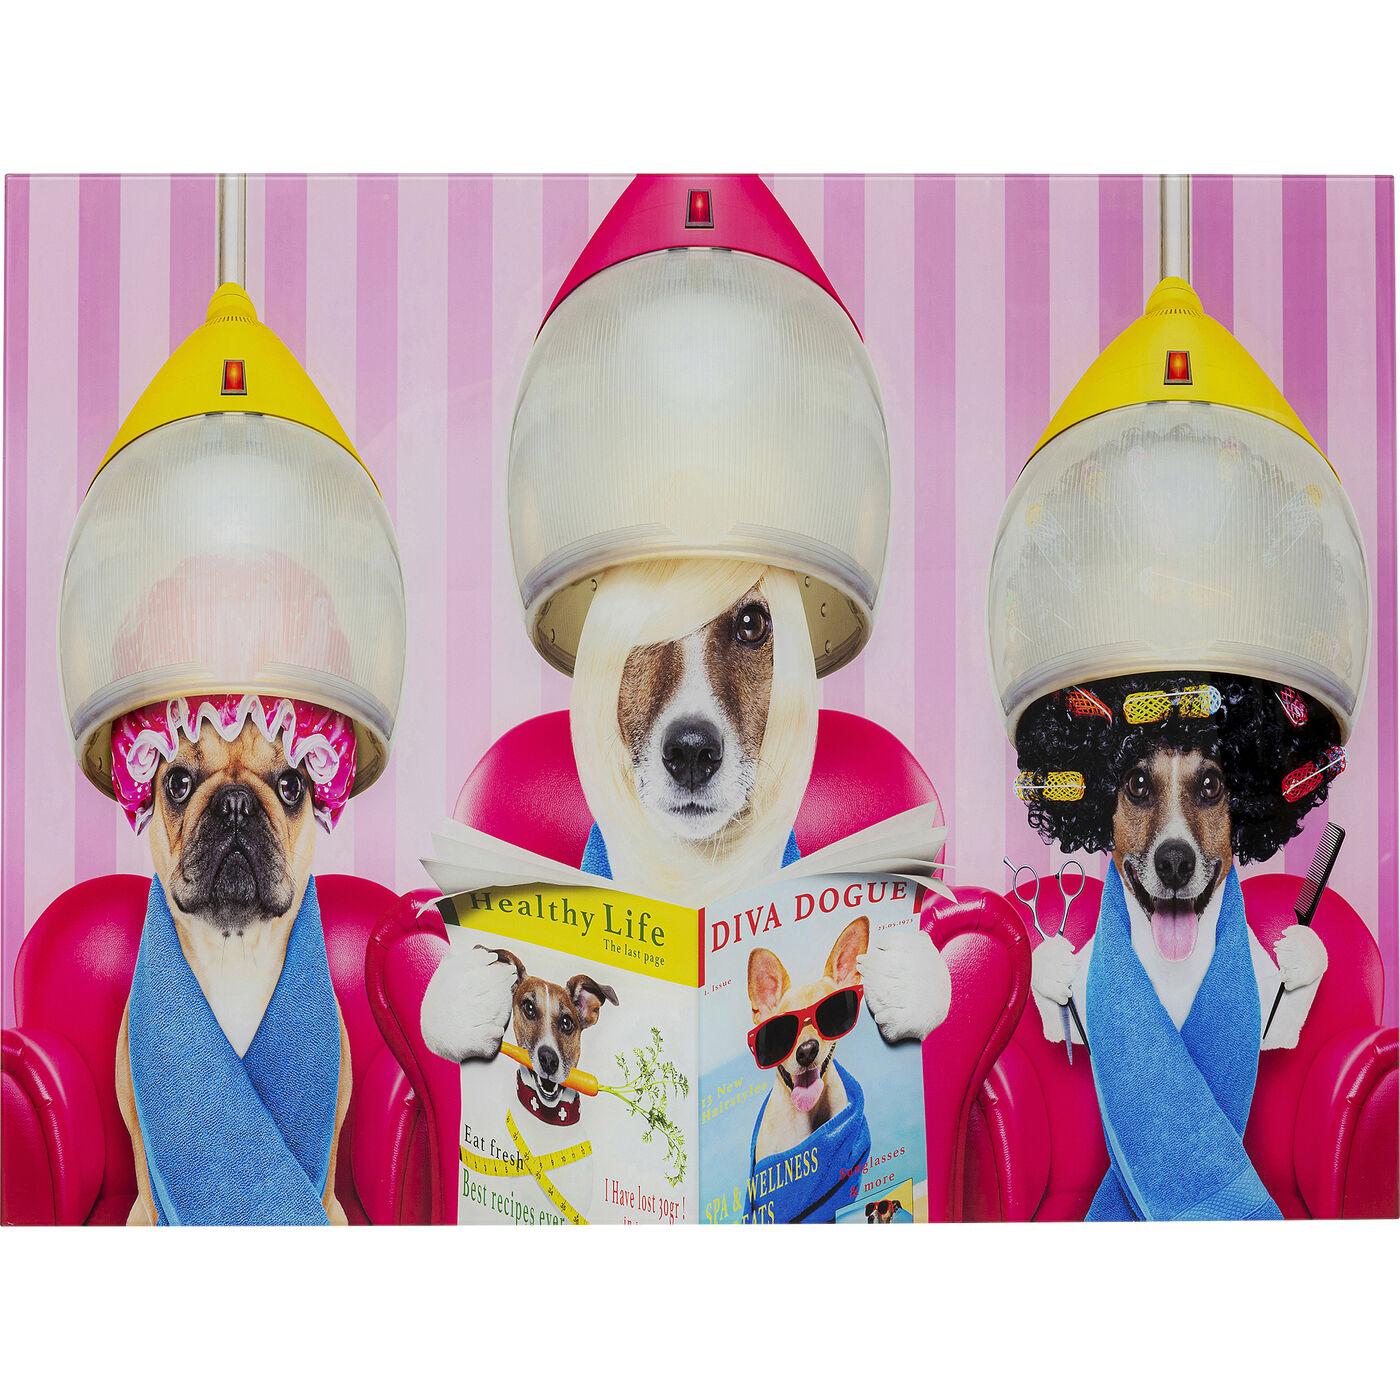 Bild Glas Dogs Day Salon 80x60